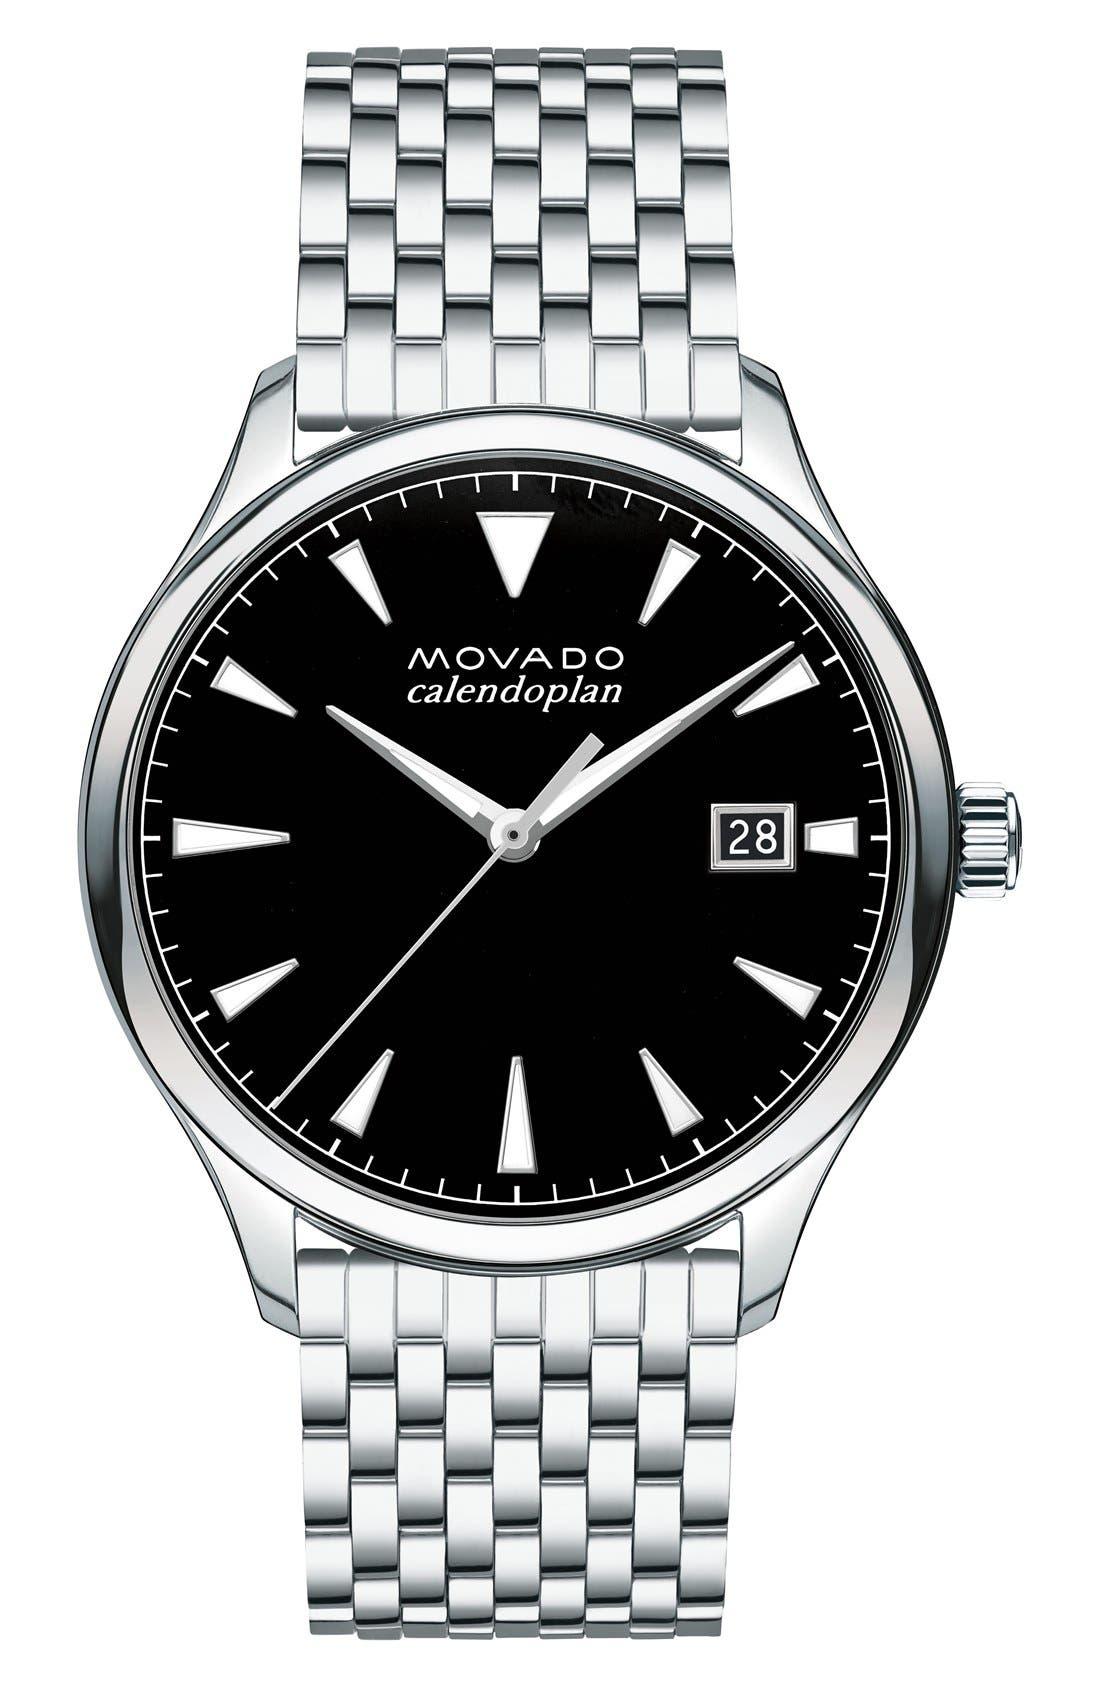 Main Image - Movado Heritage Calendoplan Bracelet Watch, 40mm